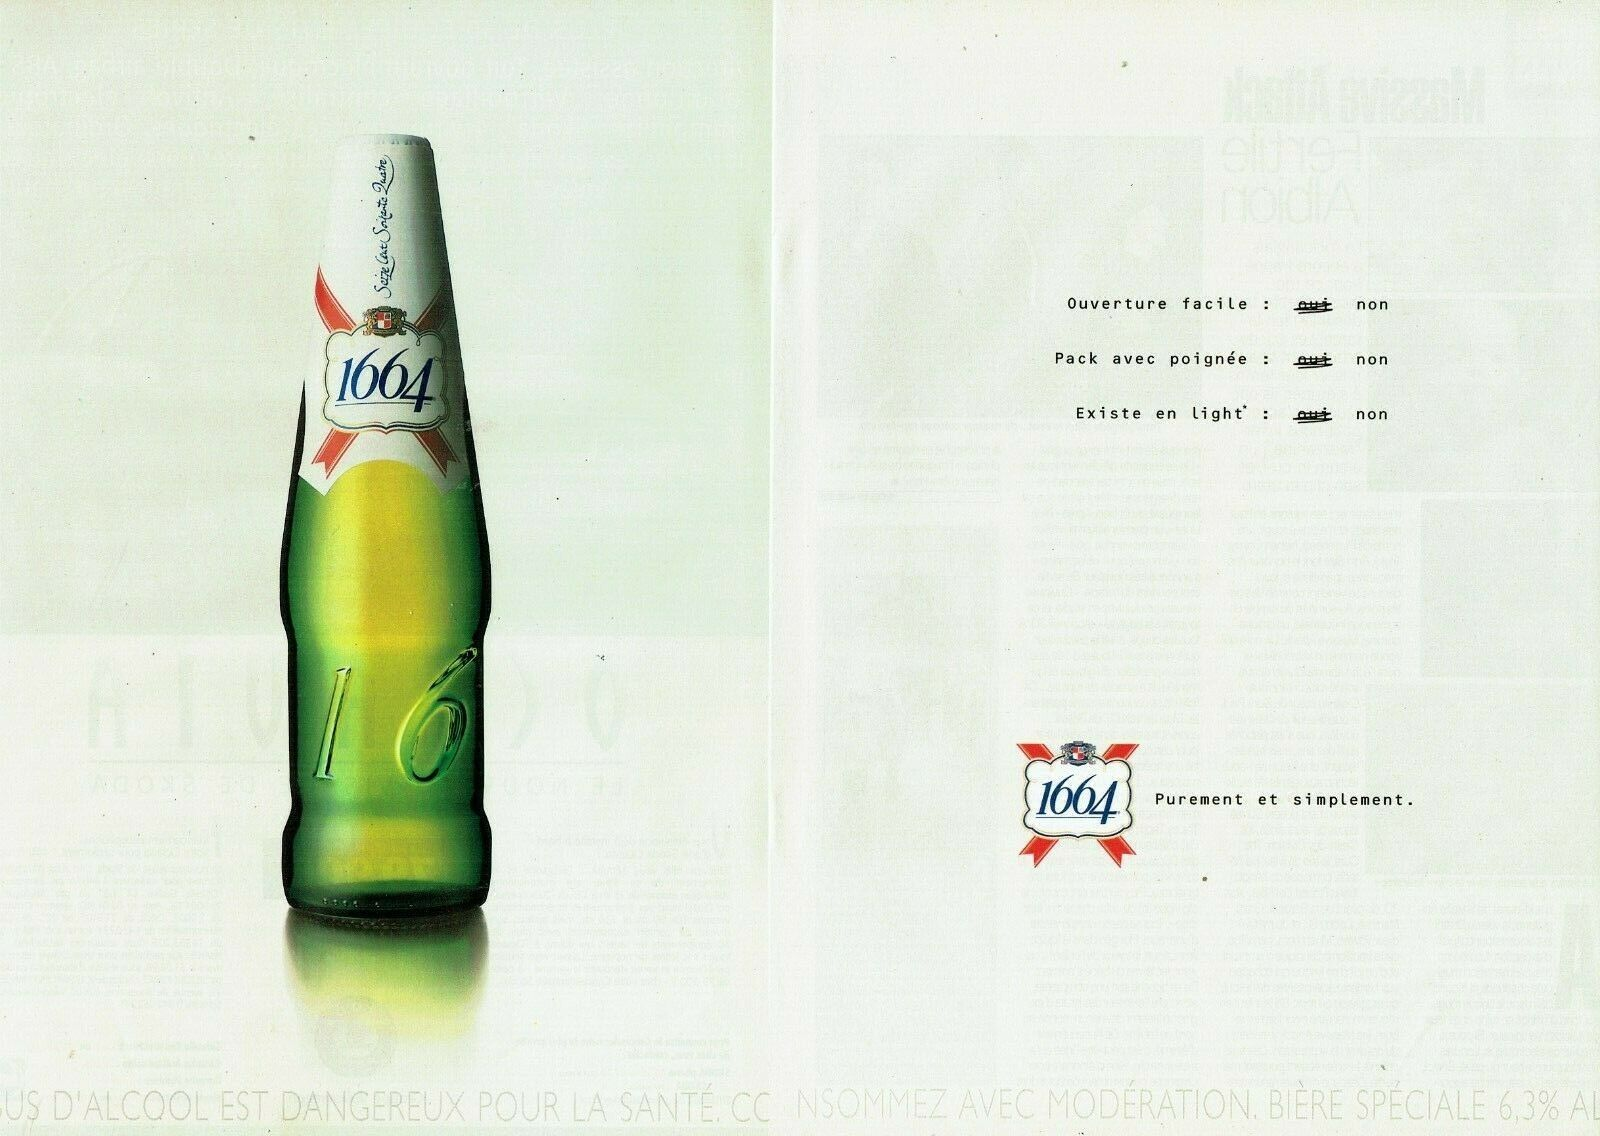 1998 biere 1664